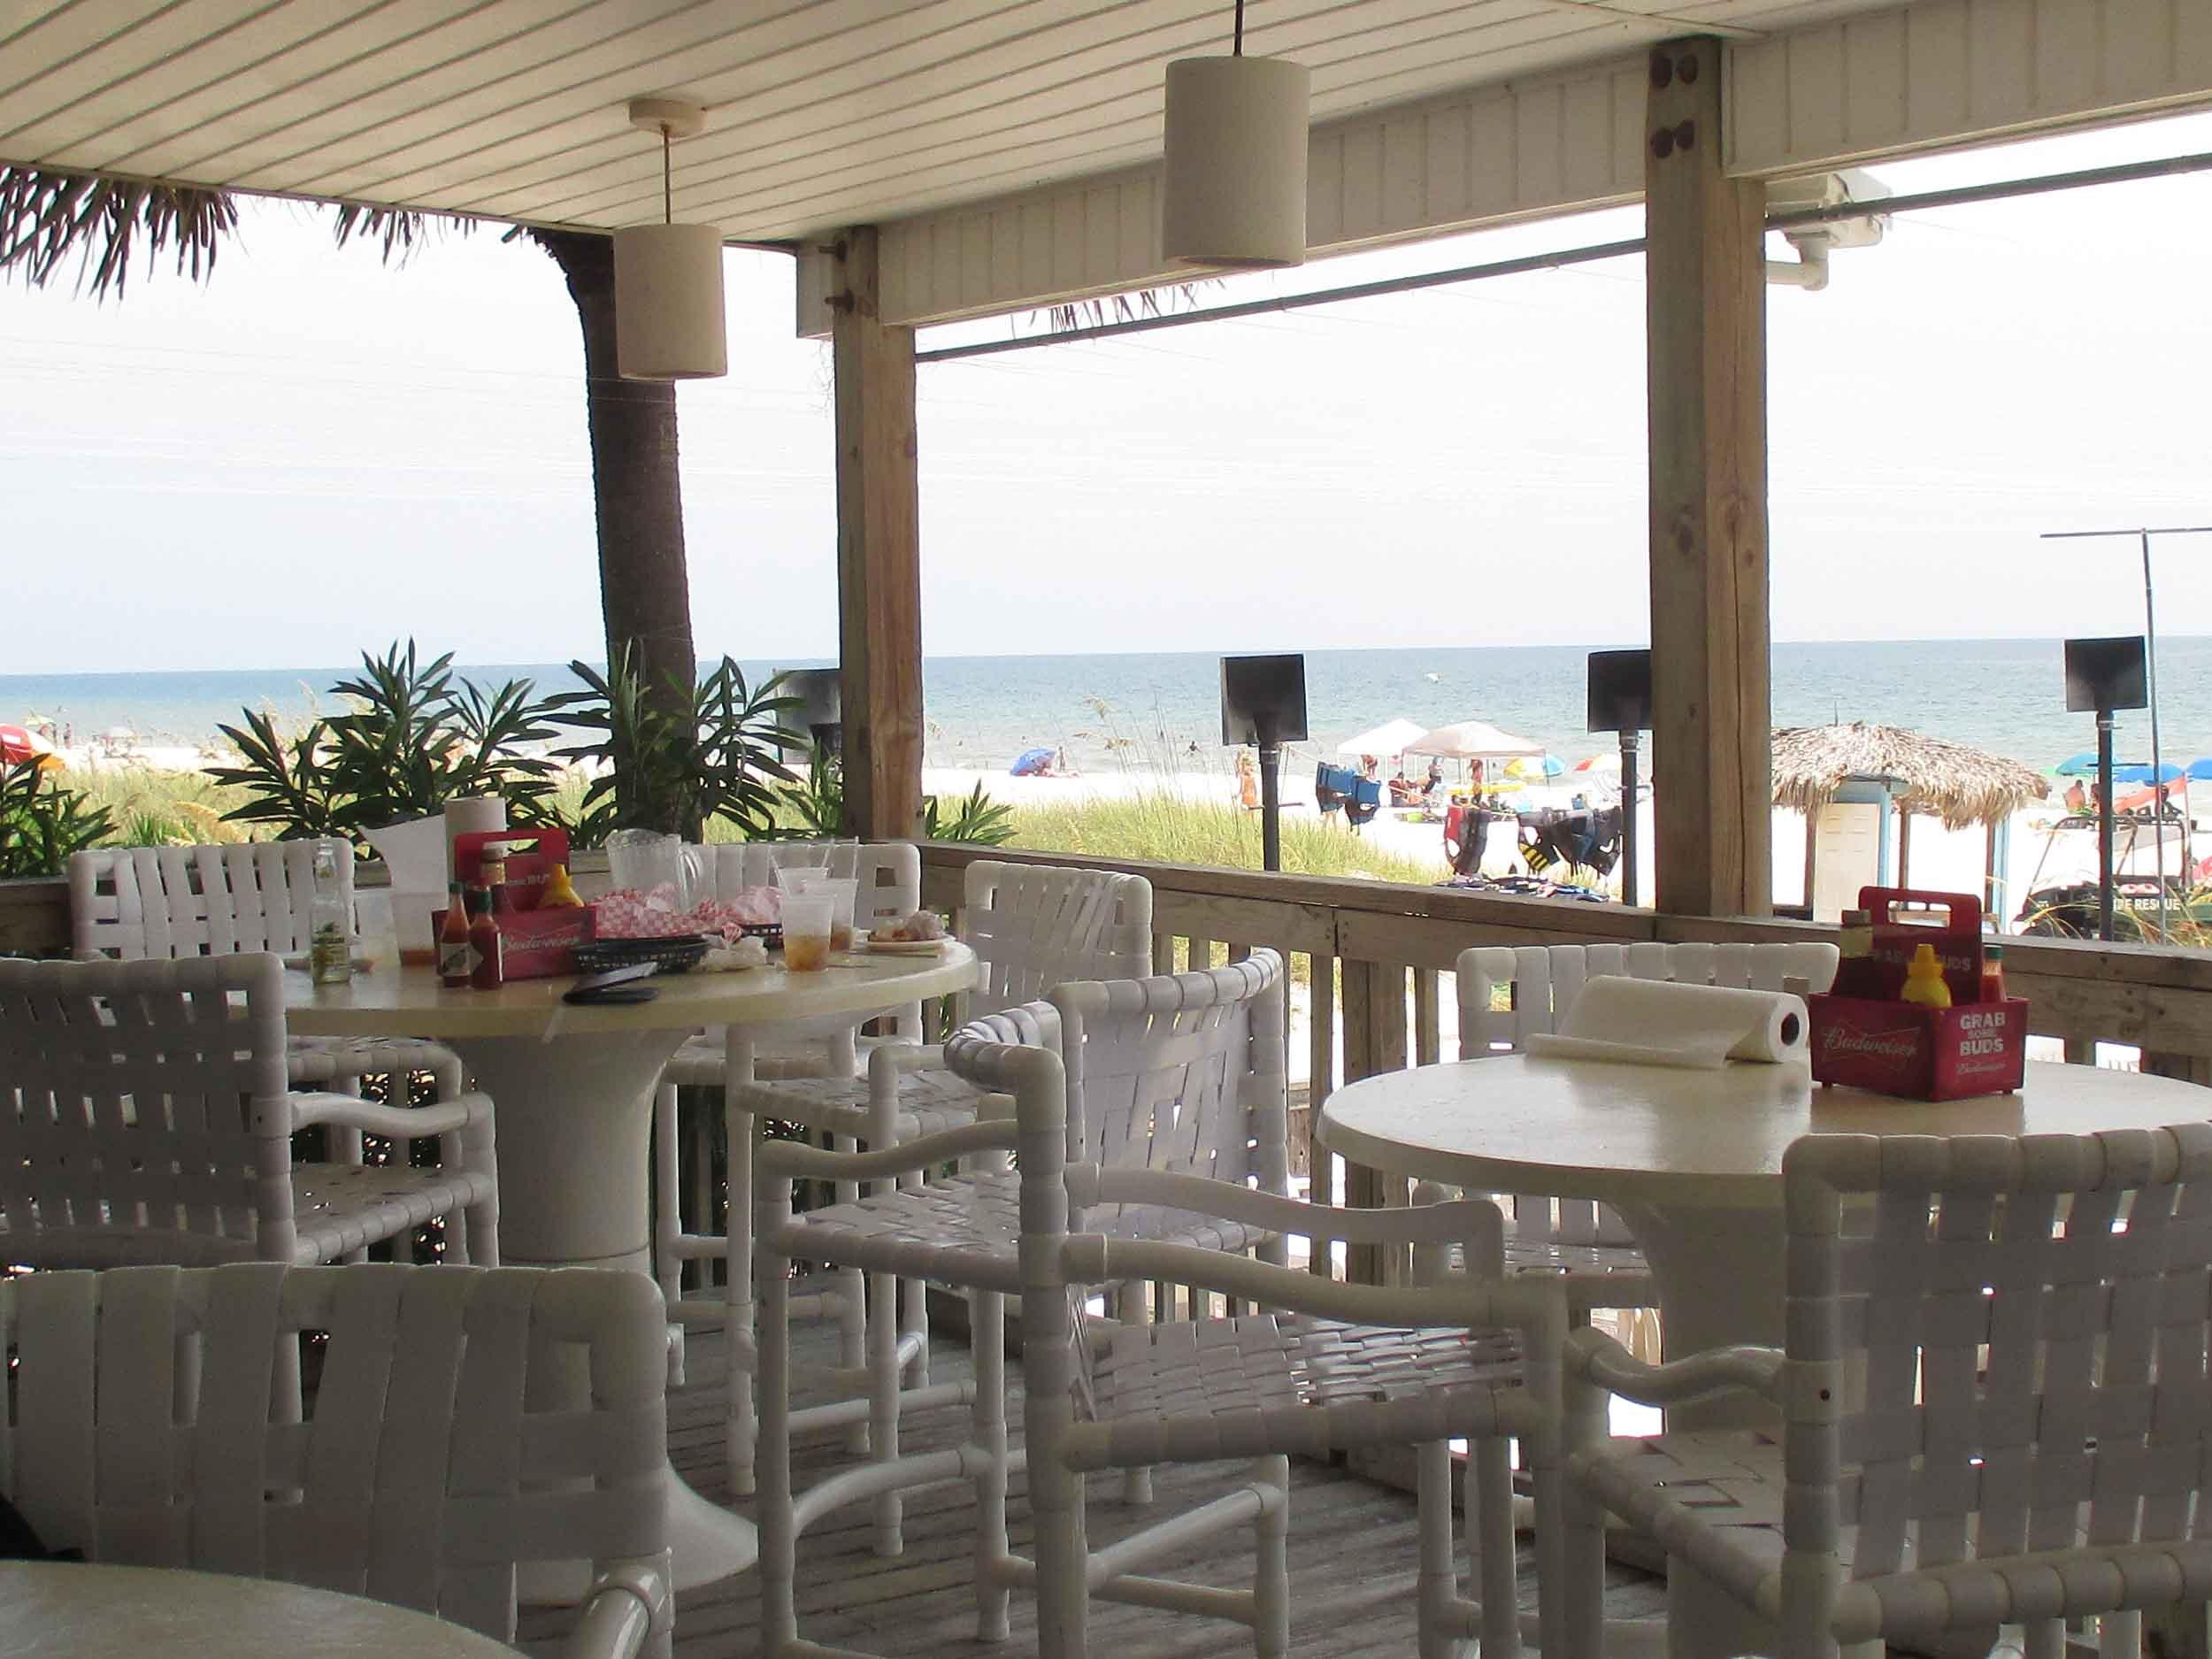 The Blue Parrot Oceanfront Cafe Patio Tables